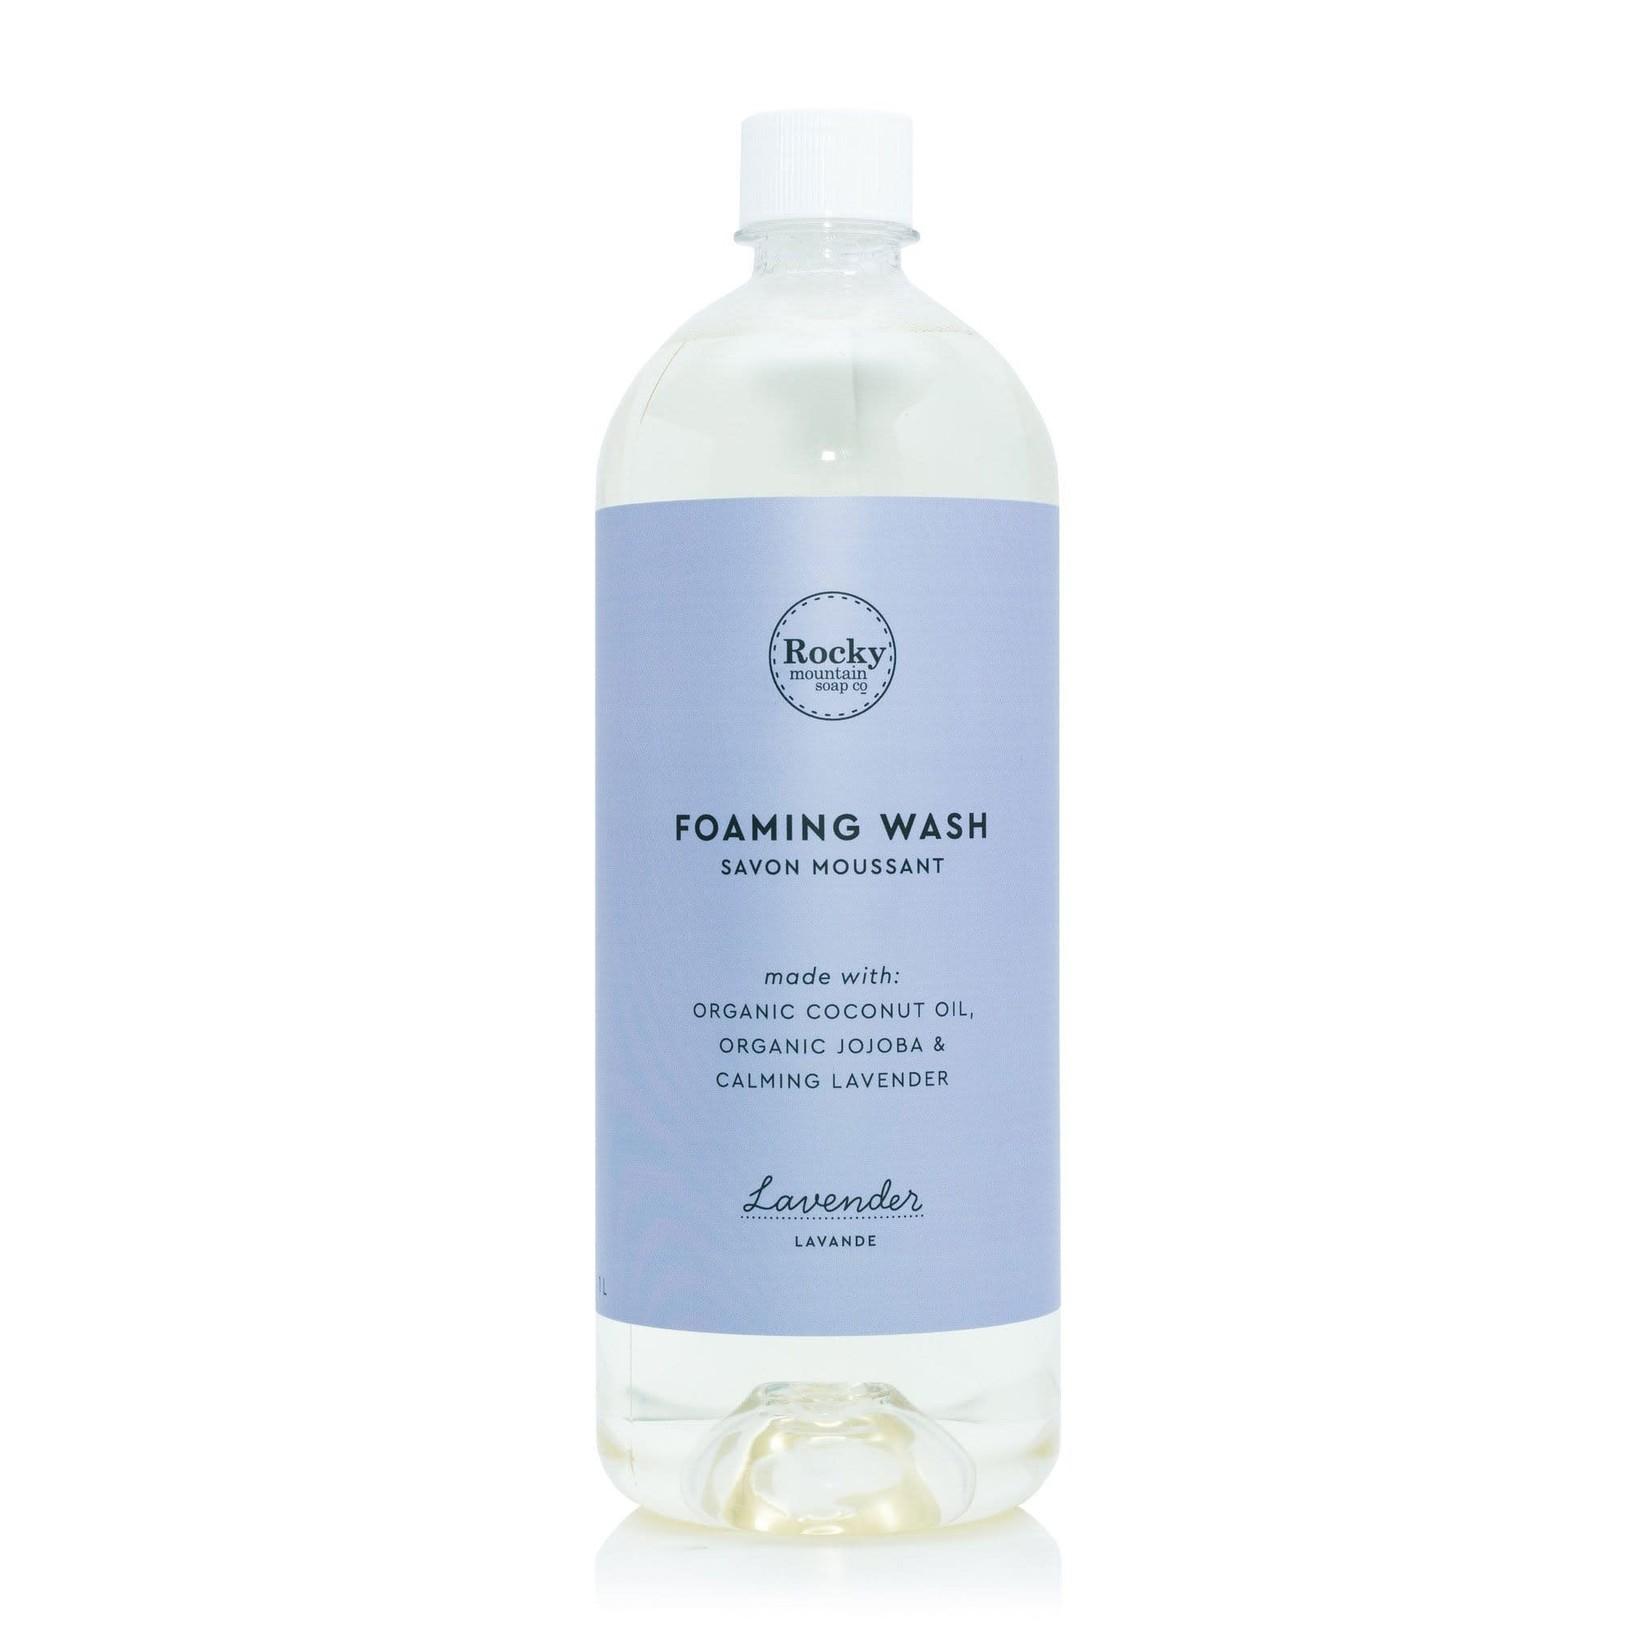 ROCKY MOUNTAIN SOAP CO. FOAMING WASH - LAVENDER